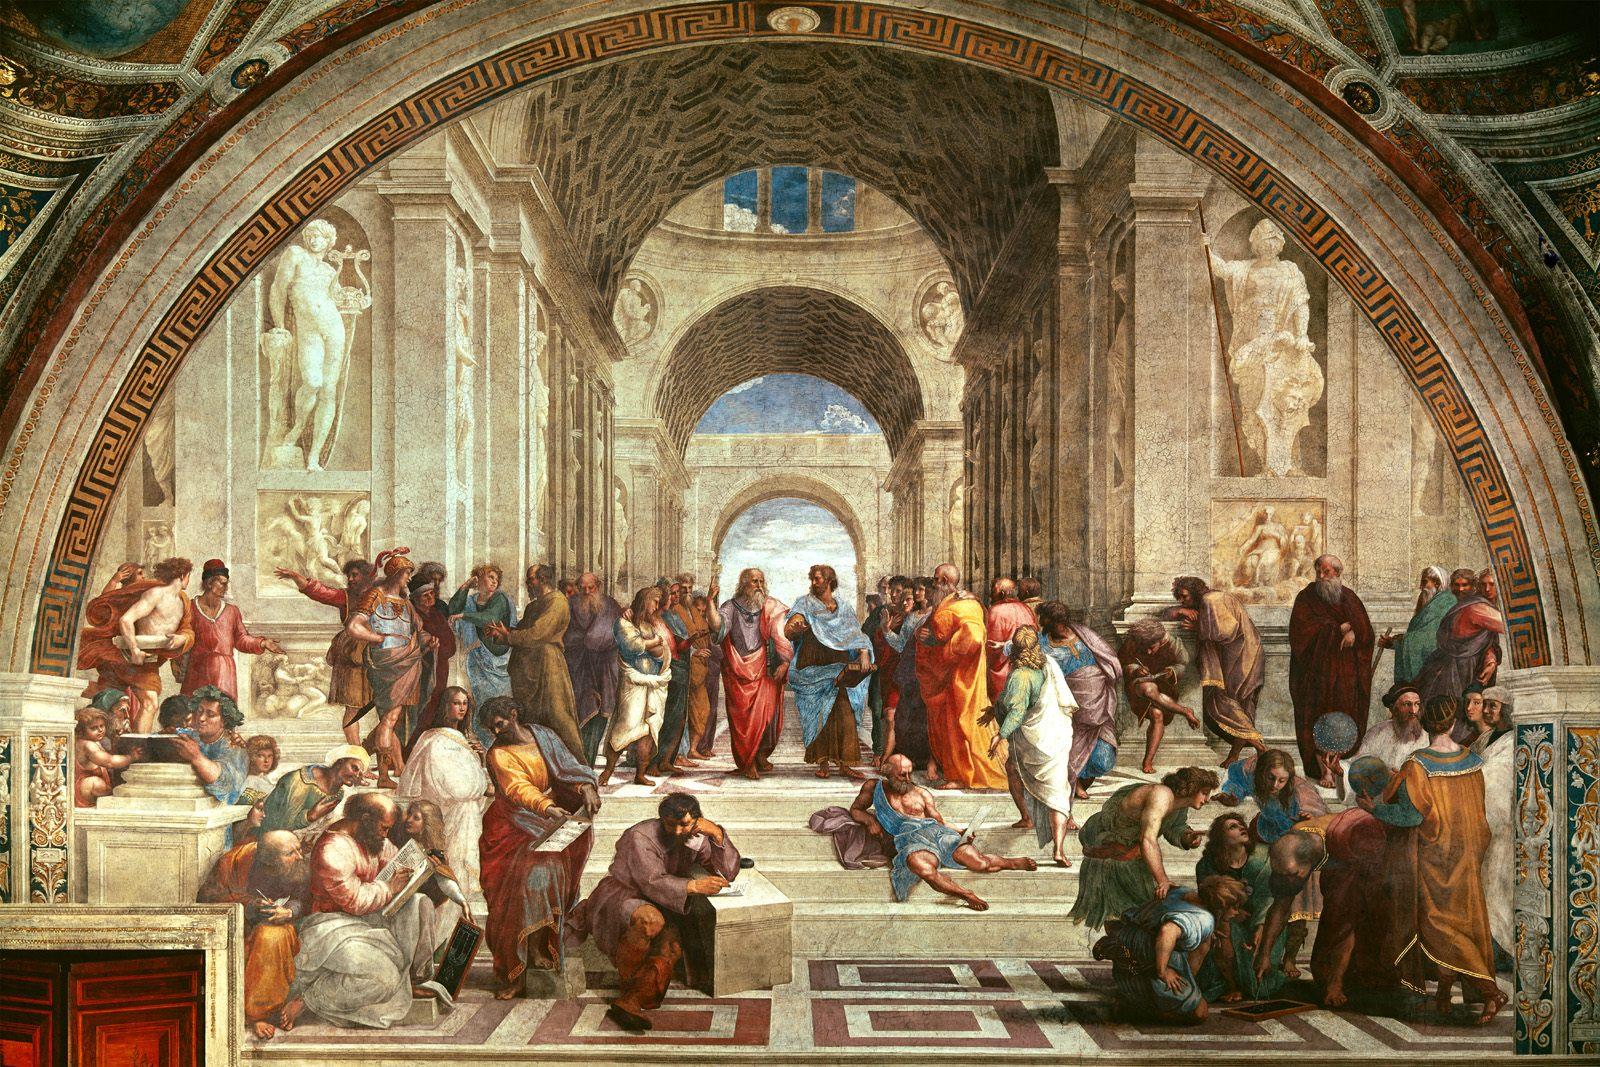 24. School of Athens